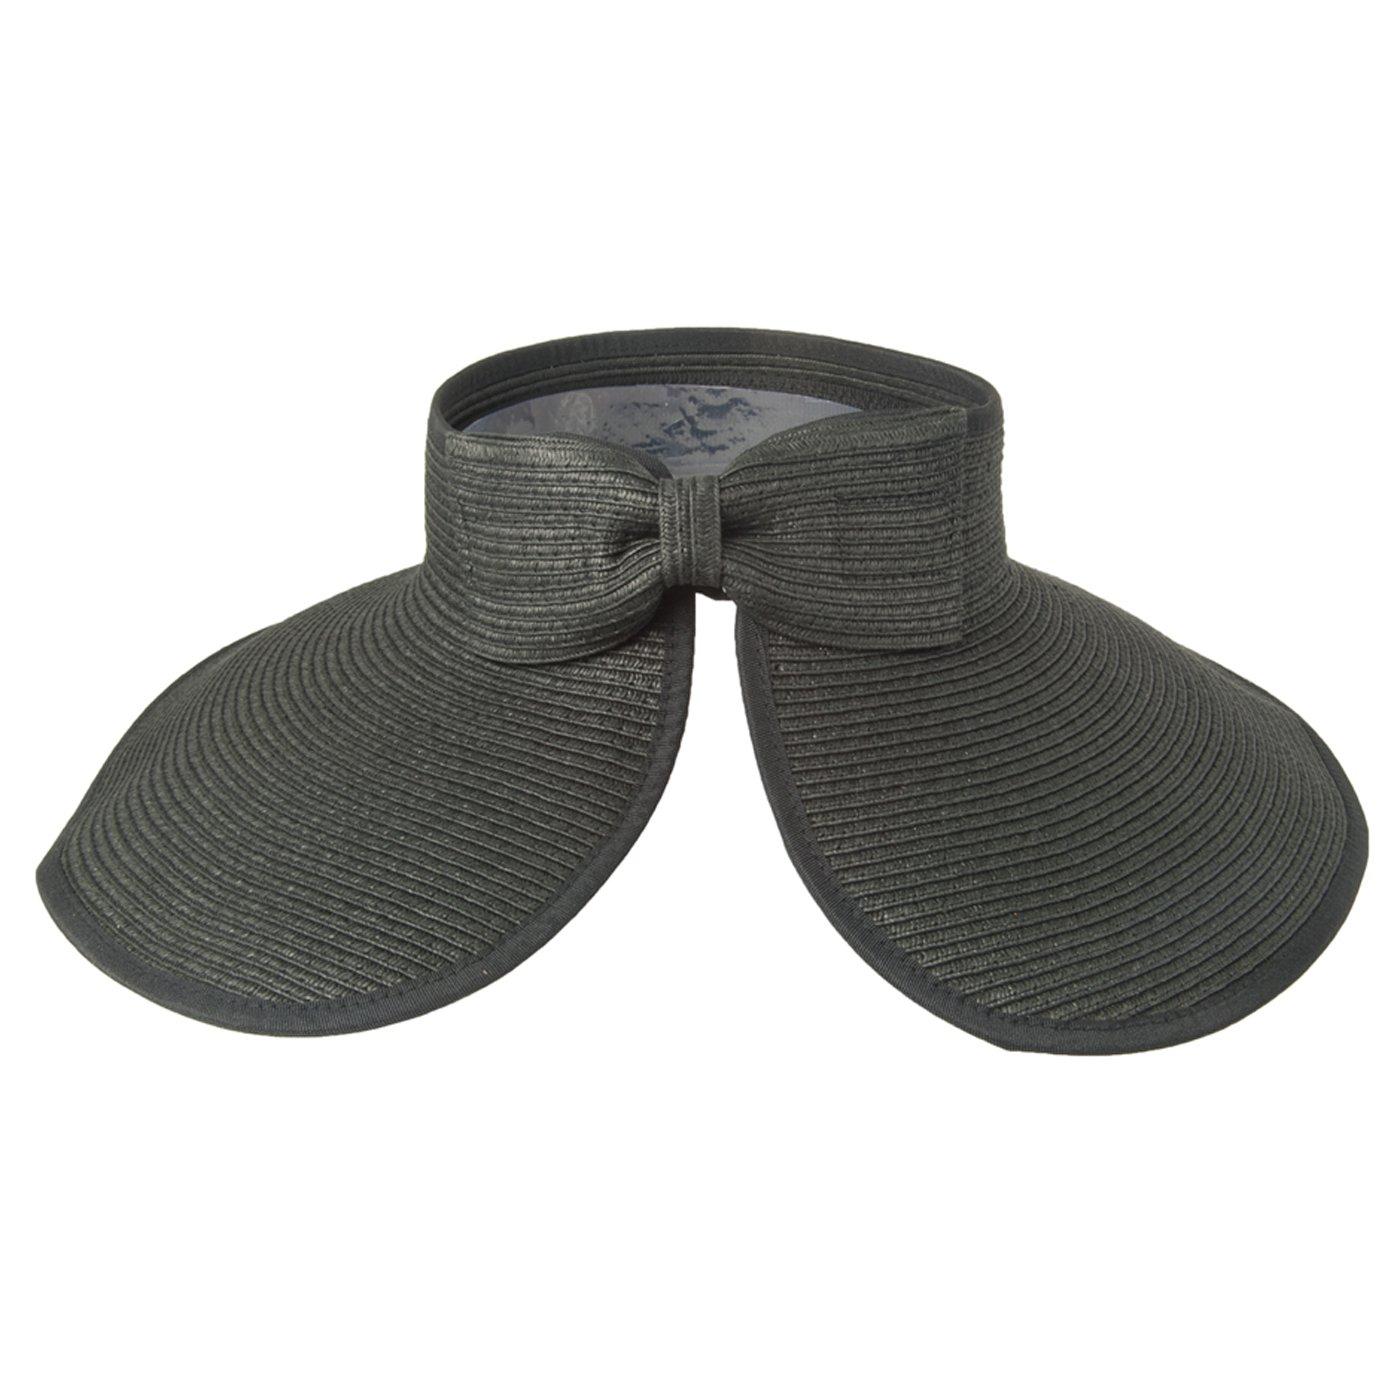 4672d59f Luxury Lane Women's Black Wide Brim Straw Sun Visor Hat at Amazon Women's  Clothing store: